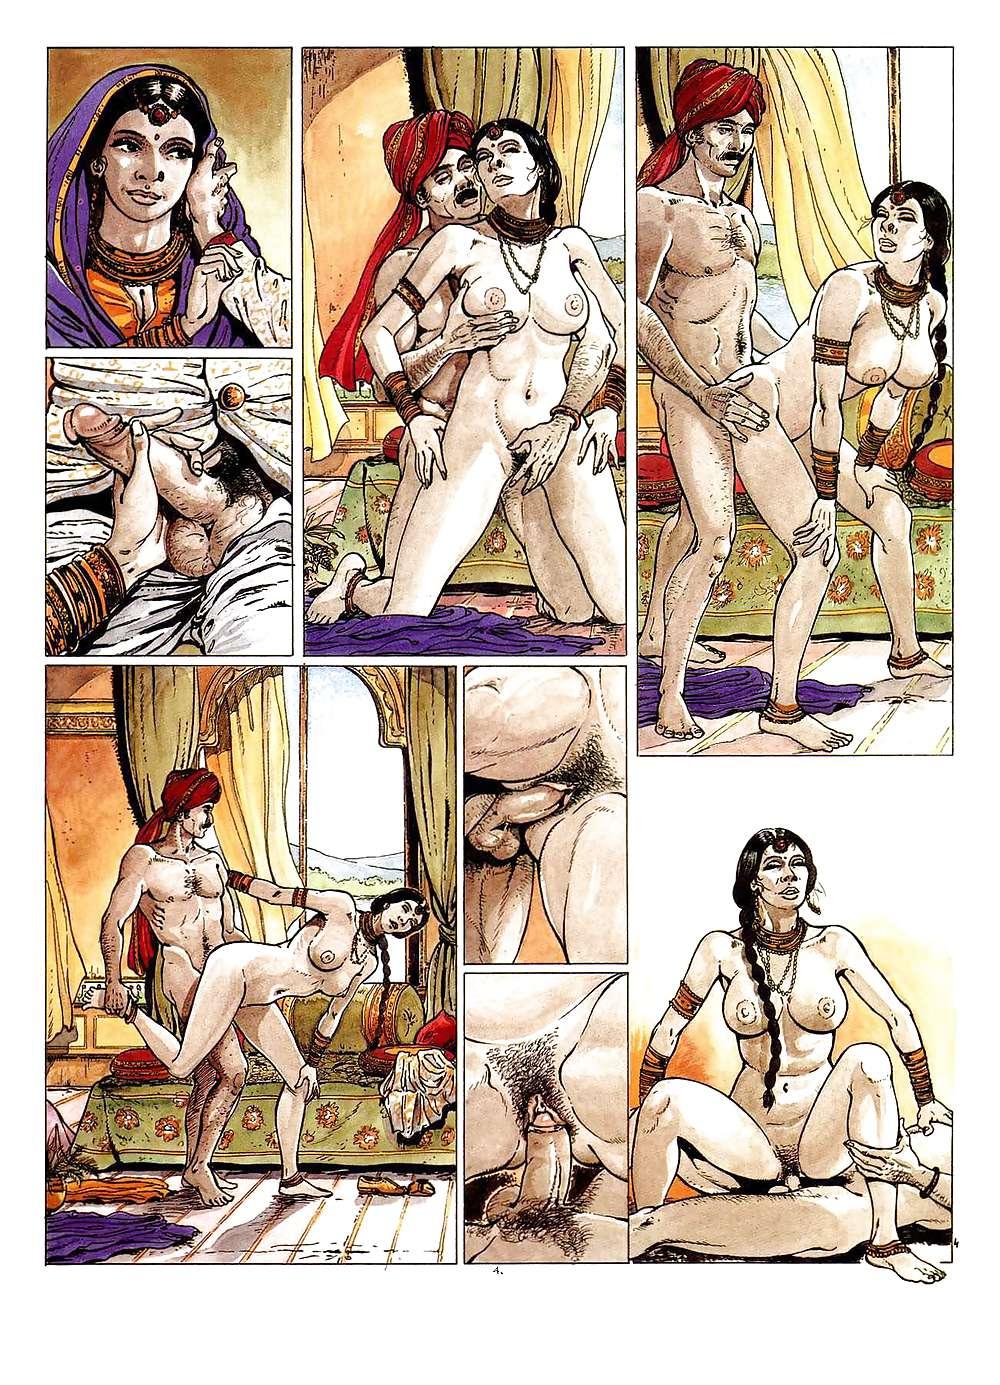 Erotic Comic Art 40 - Kama-Sutra Porn Pics #19691028